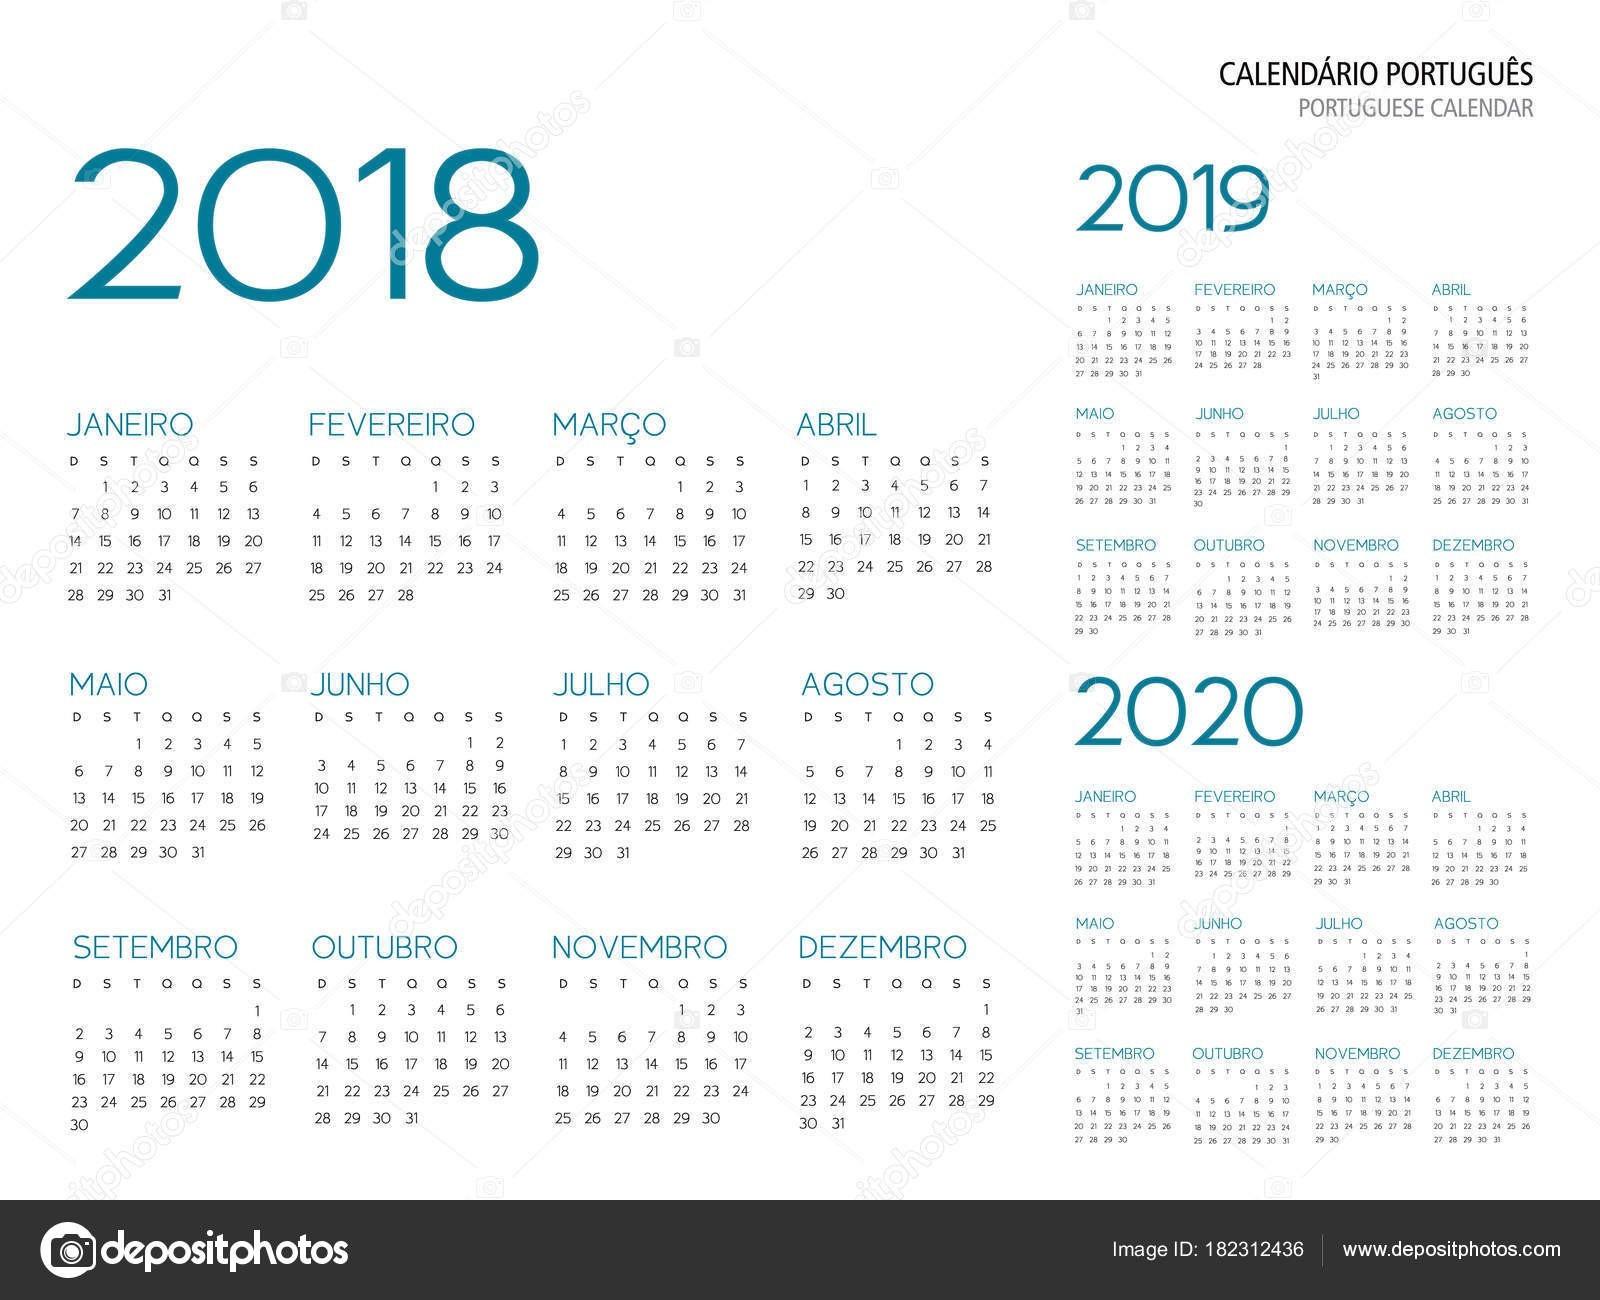 calendario 2019 imprimir portugues mas caliente portugalska kalendaac299 2018 2019 2020 vektor stock vektor of calendario 2019 imprimir portugues